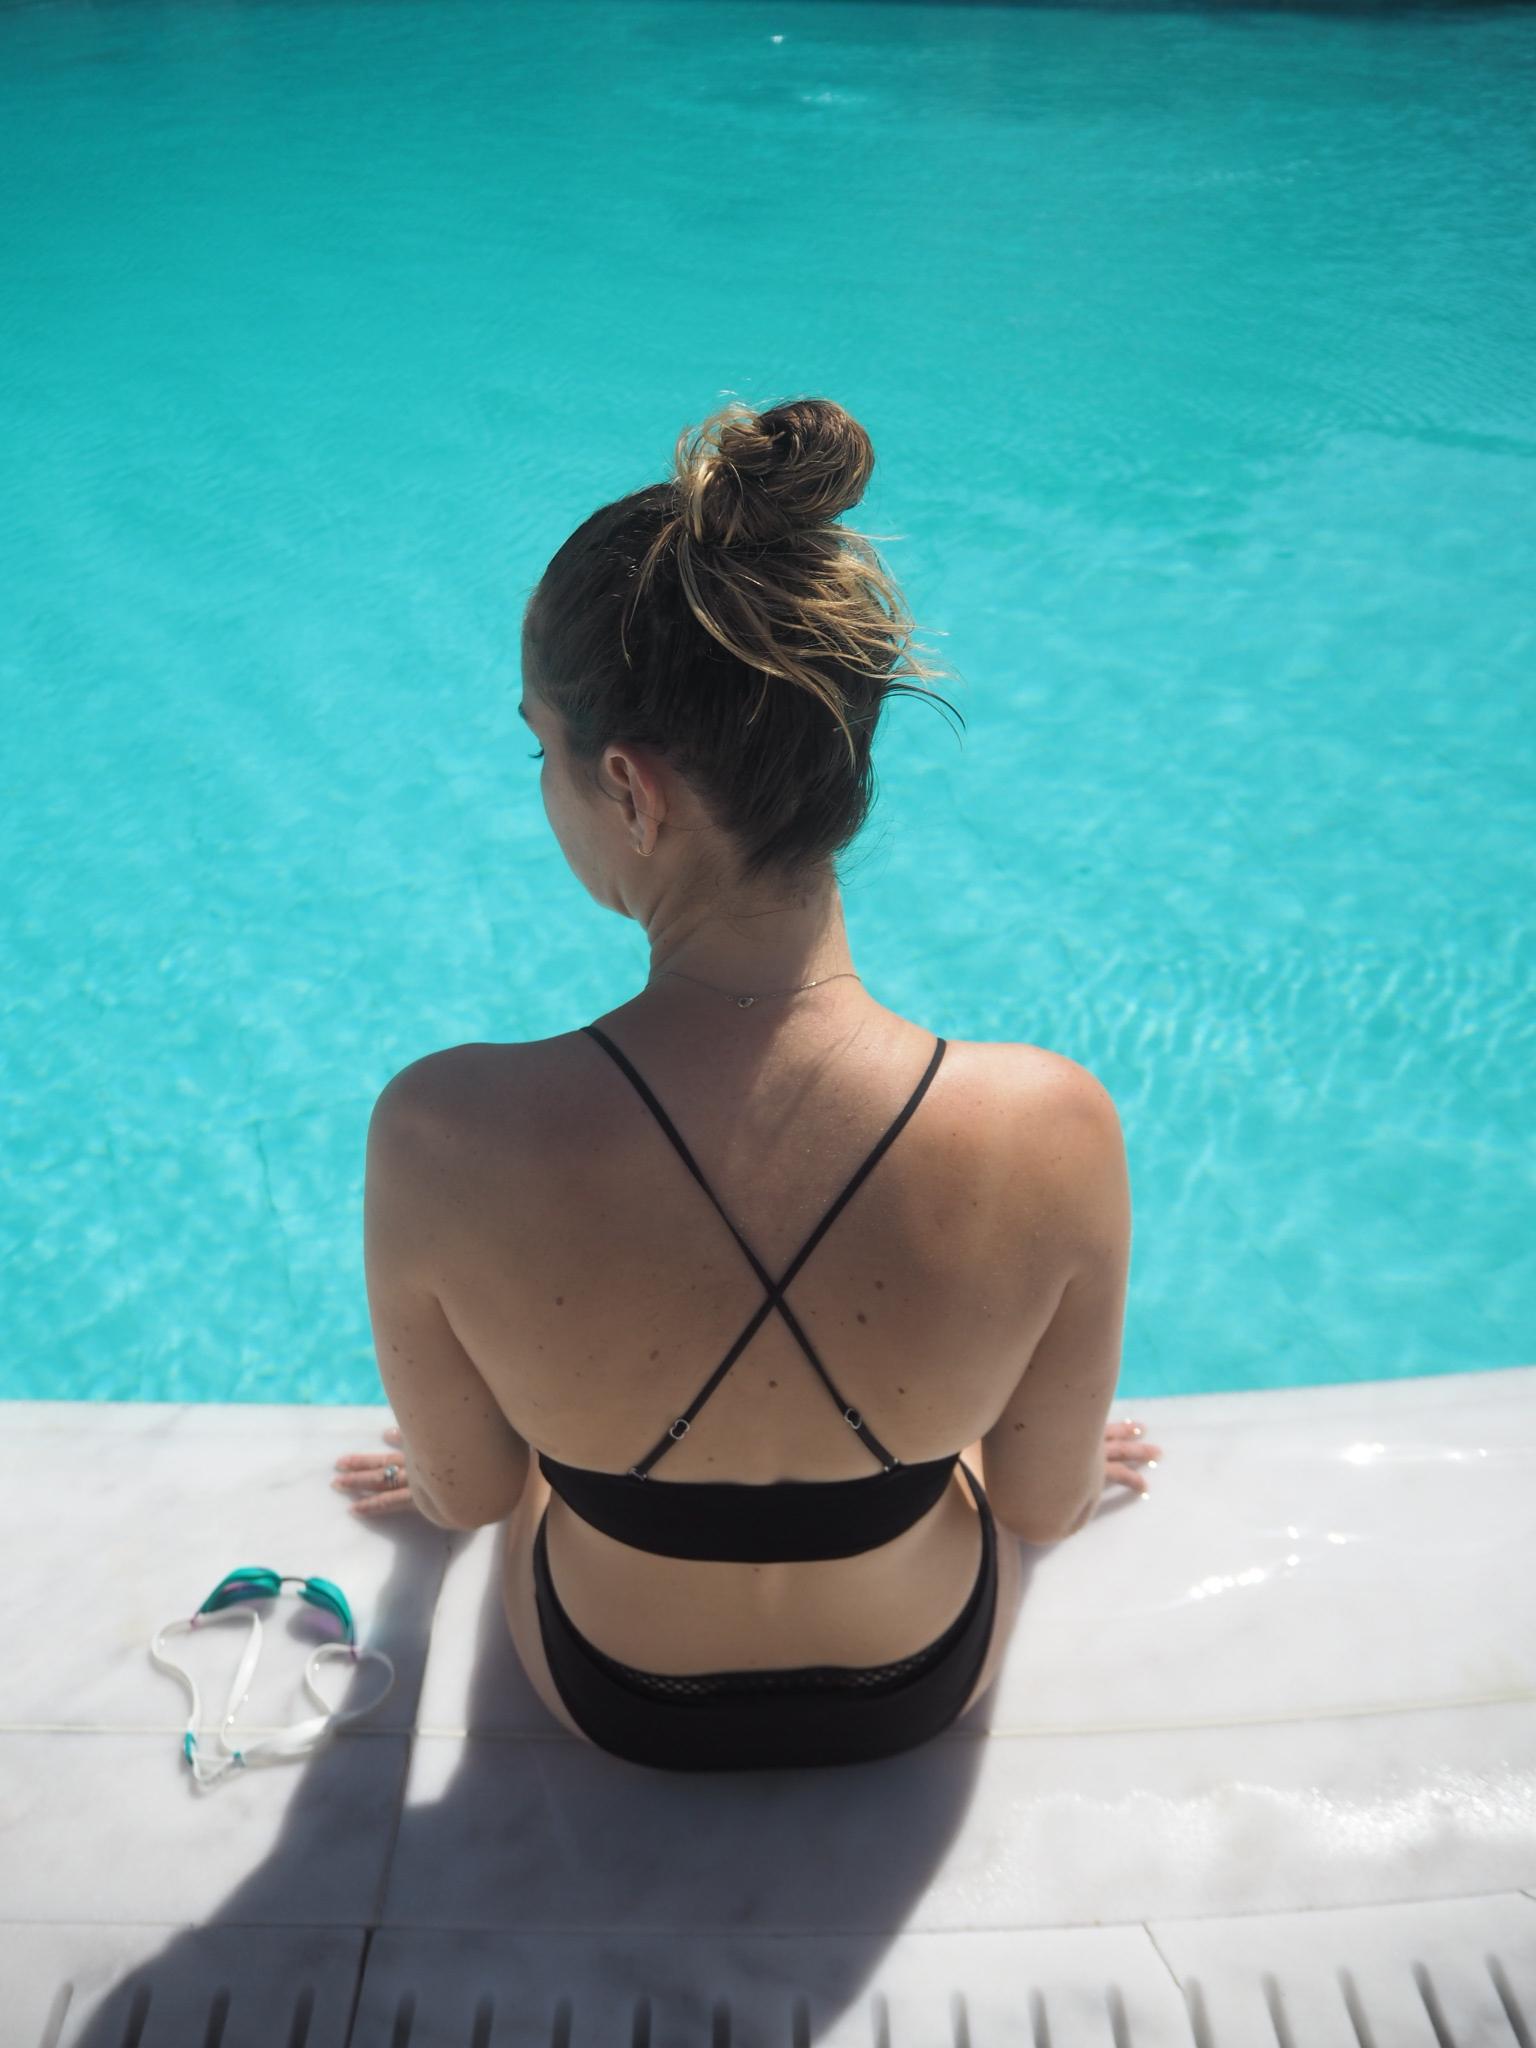 Contemplating a swim in Mykonos